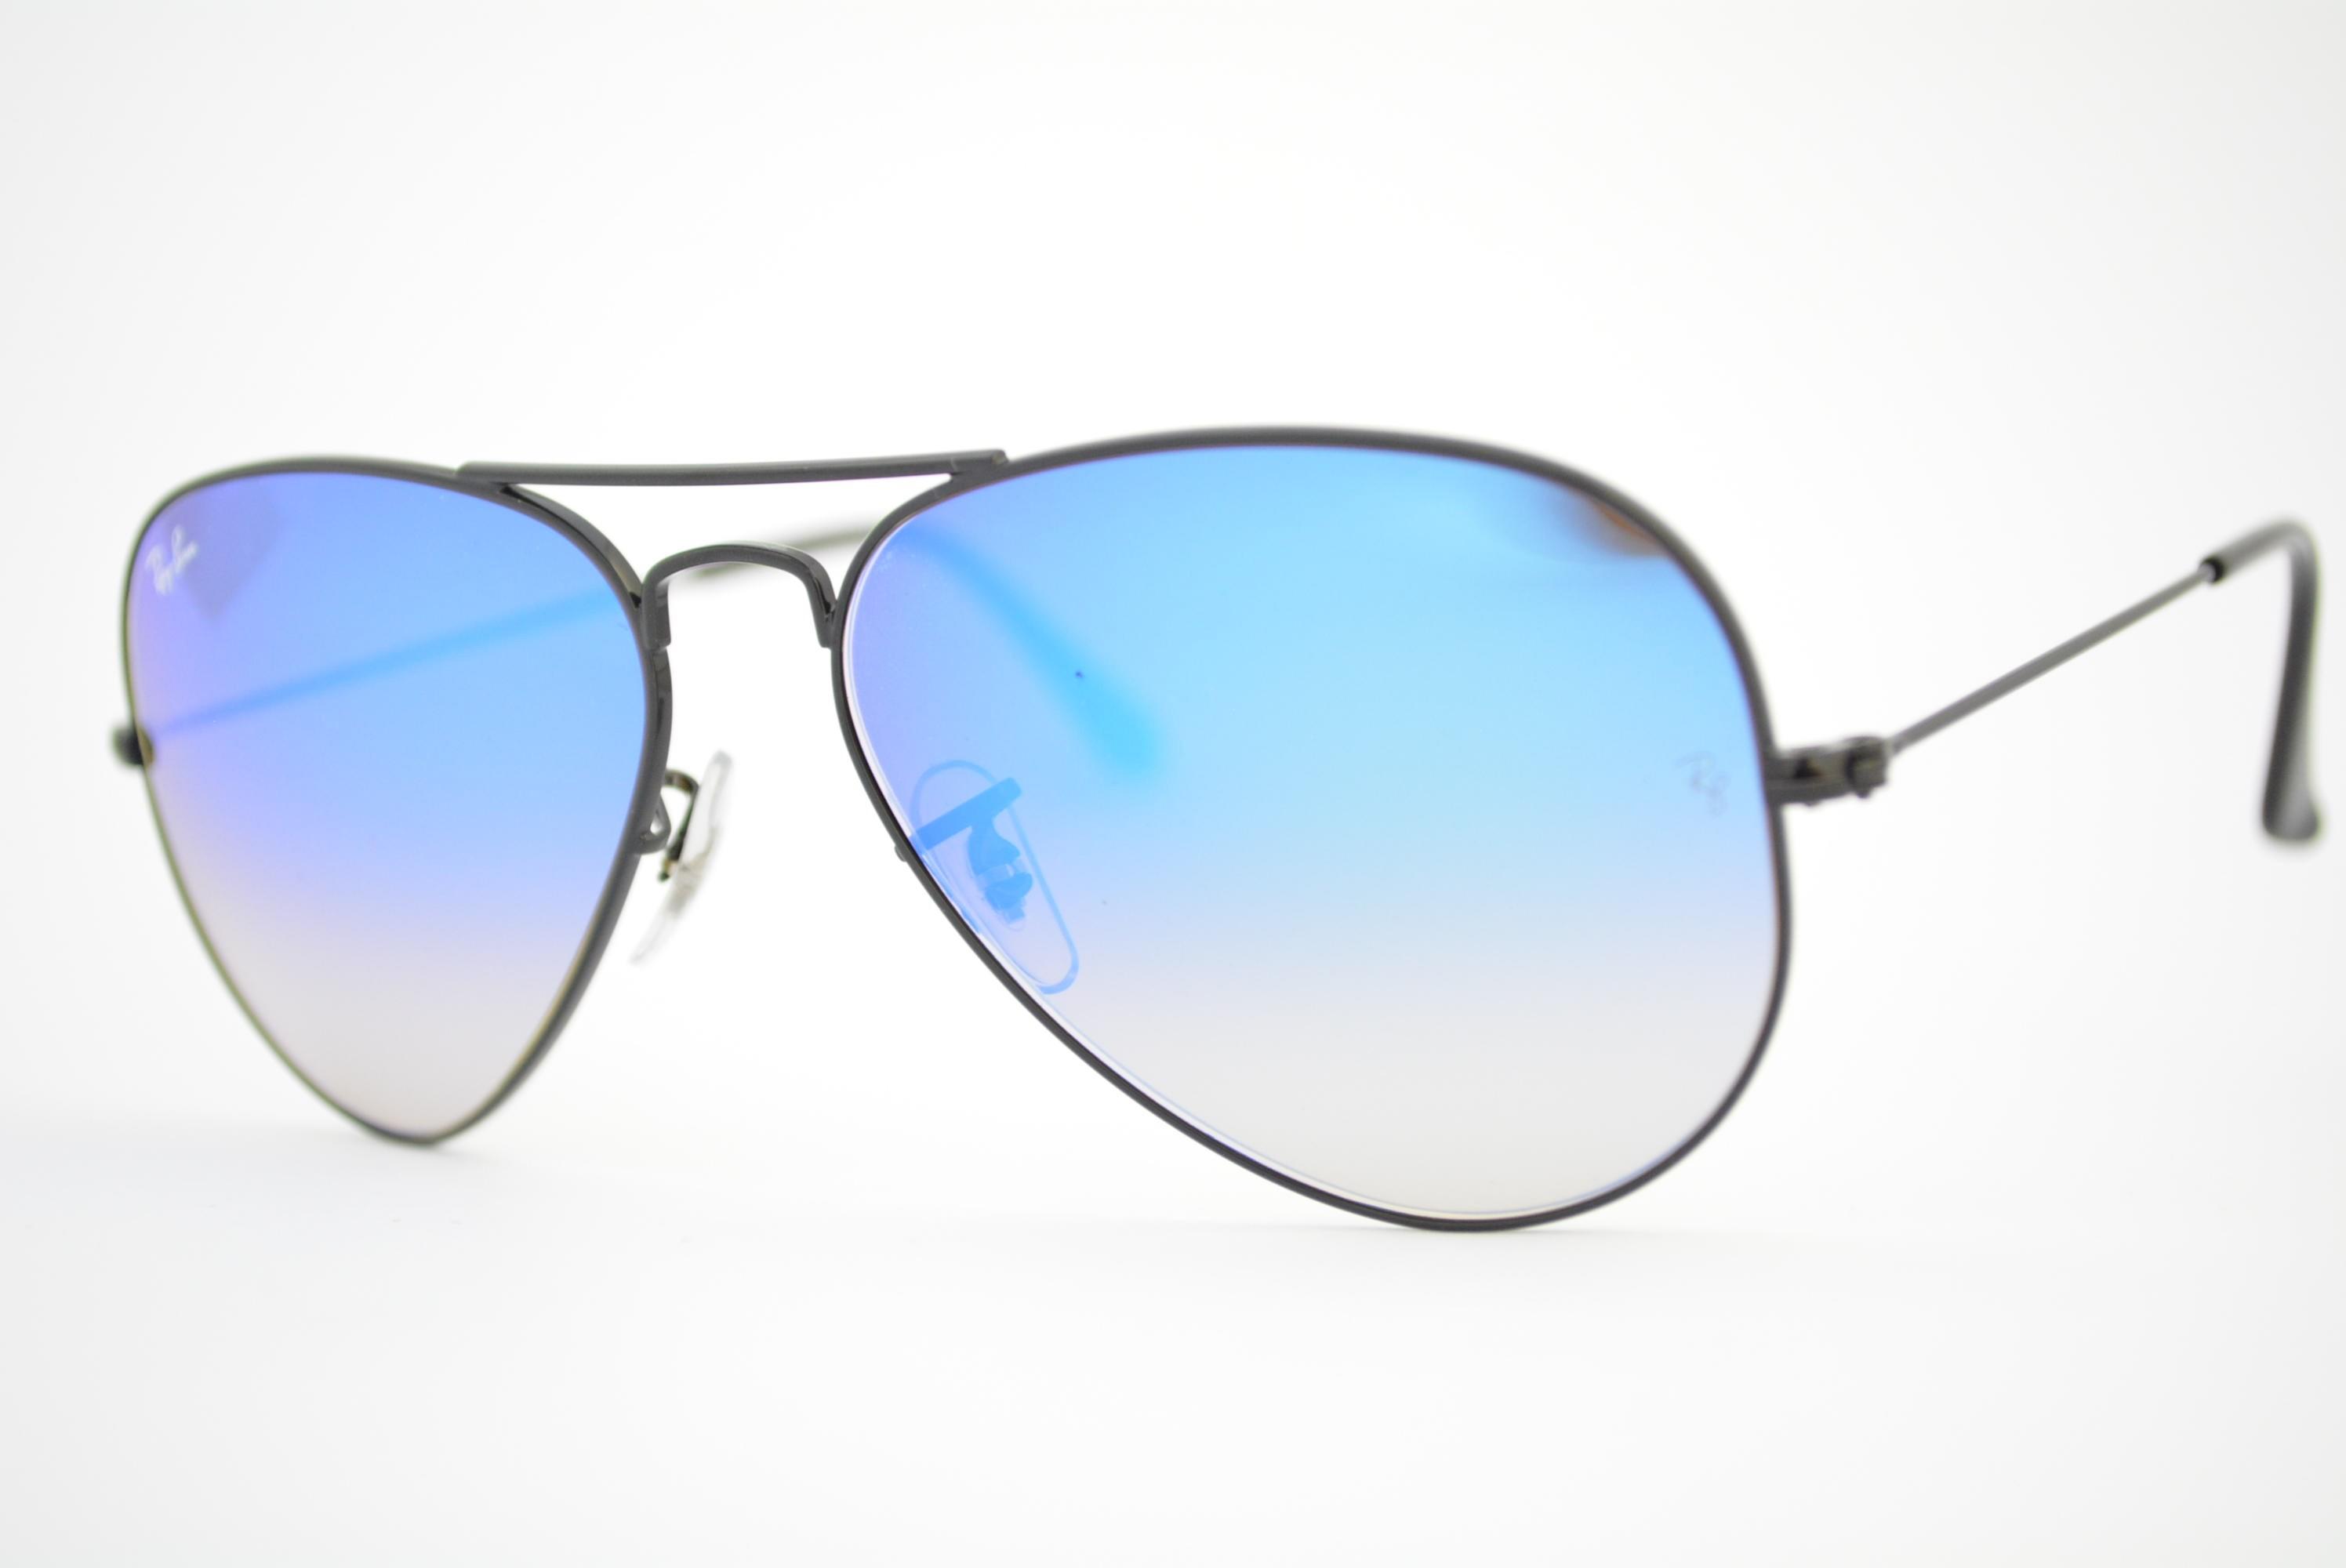 óculos de sol Ray Ban aviator large mod rb3025 002 4O Ótica Cardoso 7a47f4c7a6